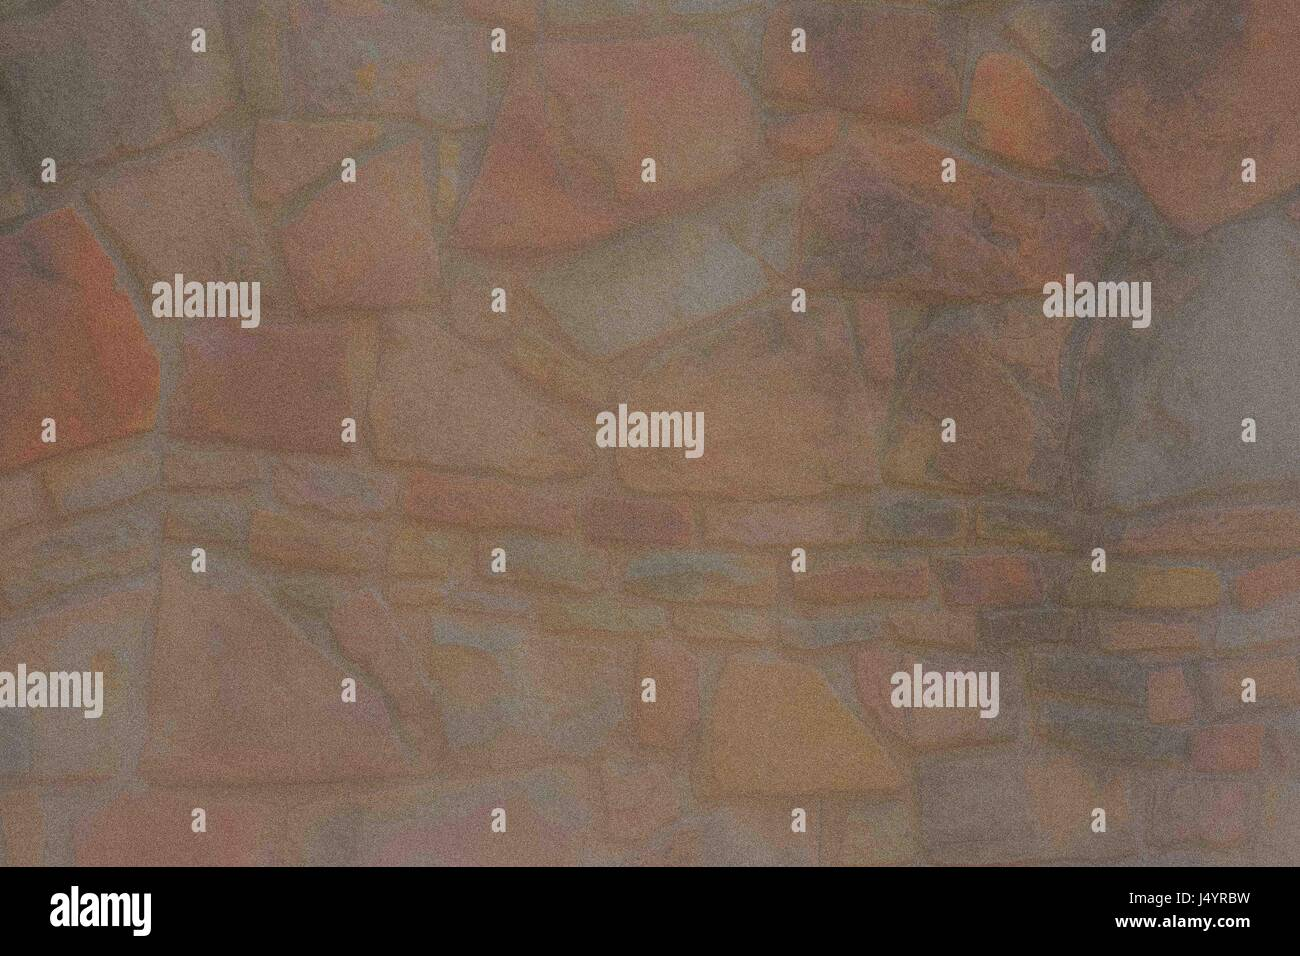 Pastel blurred stonewall background backdrop - Stock Image